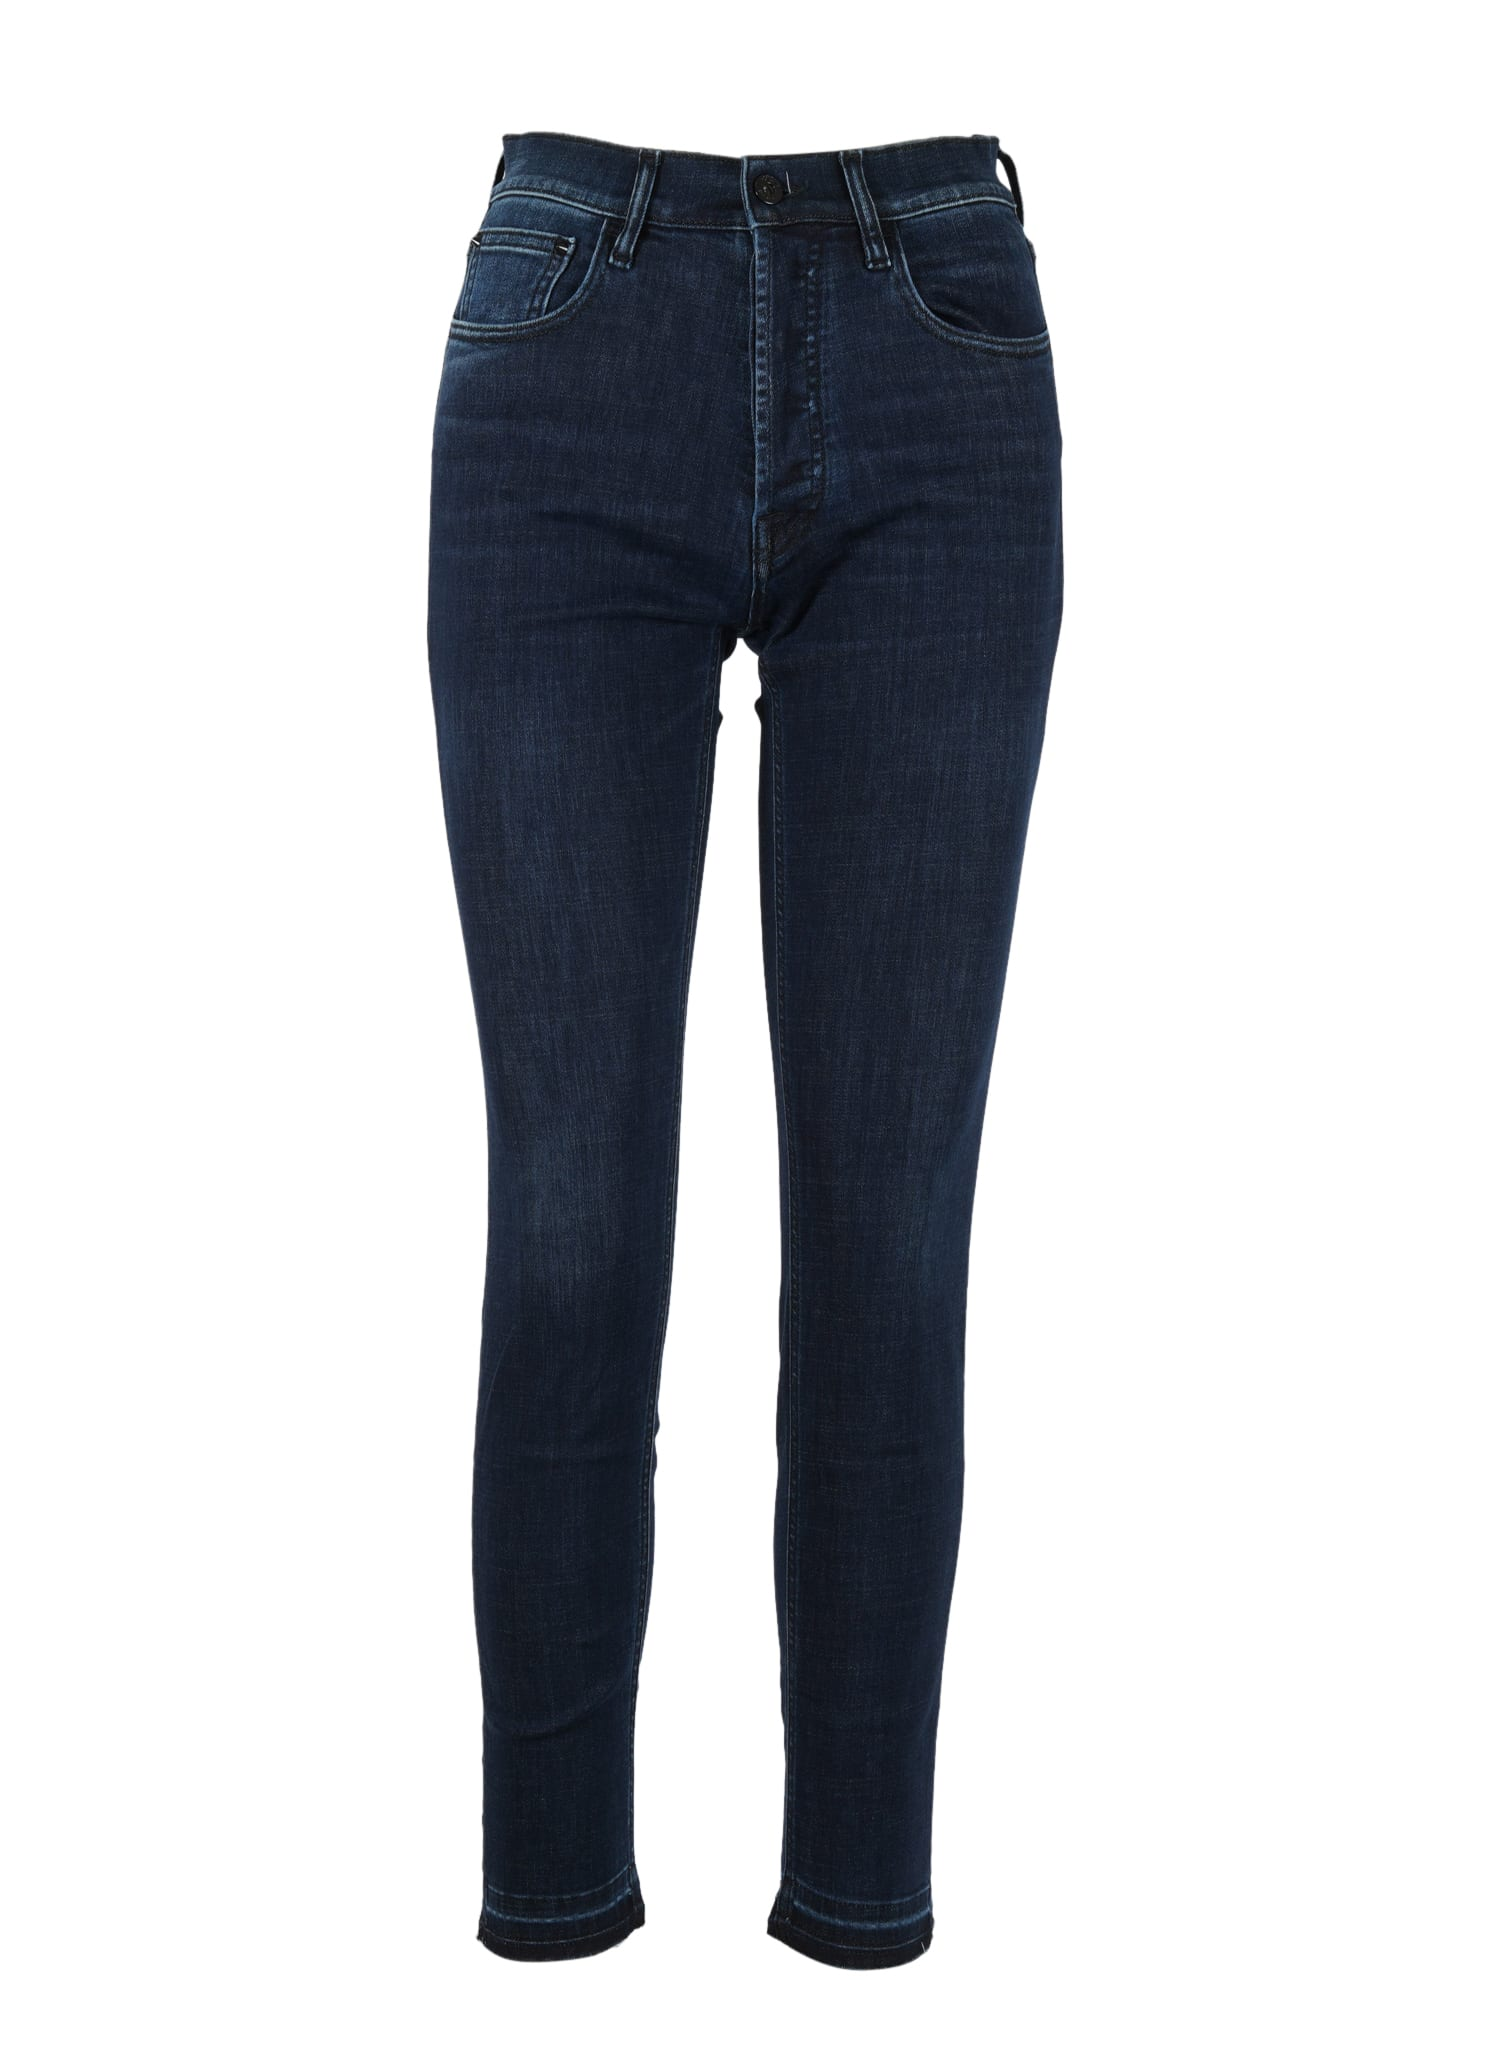 Body Slim High Rise Jeans